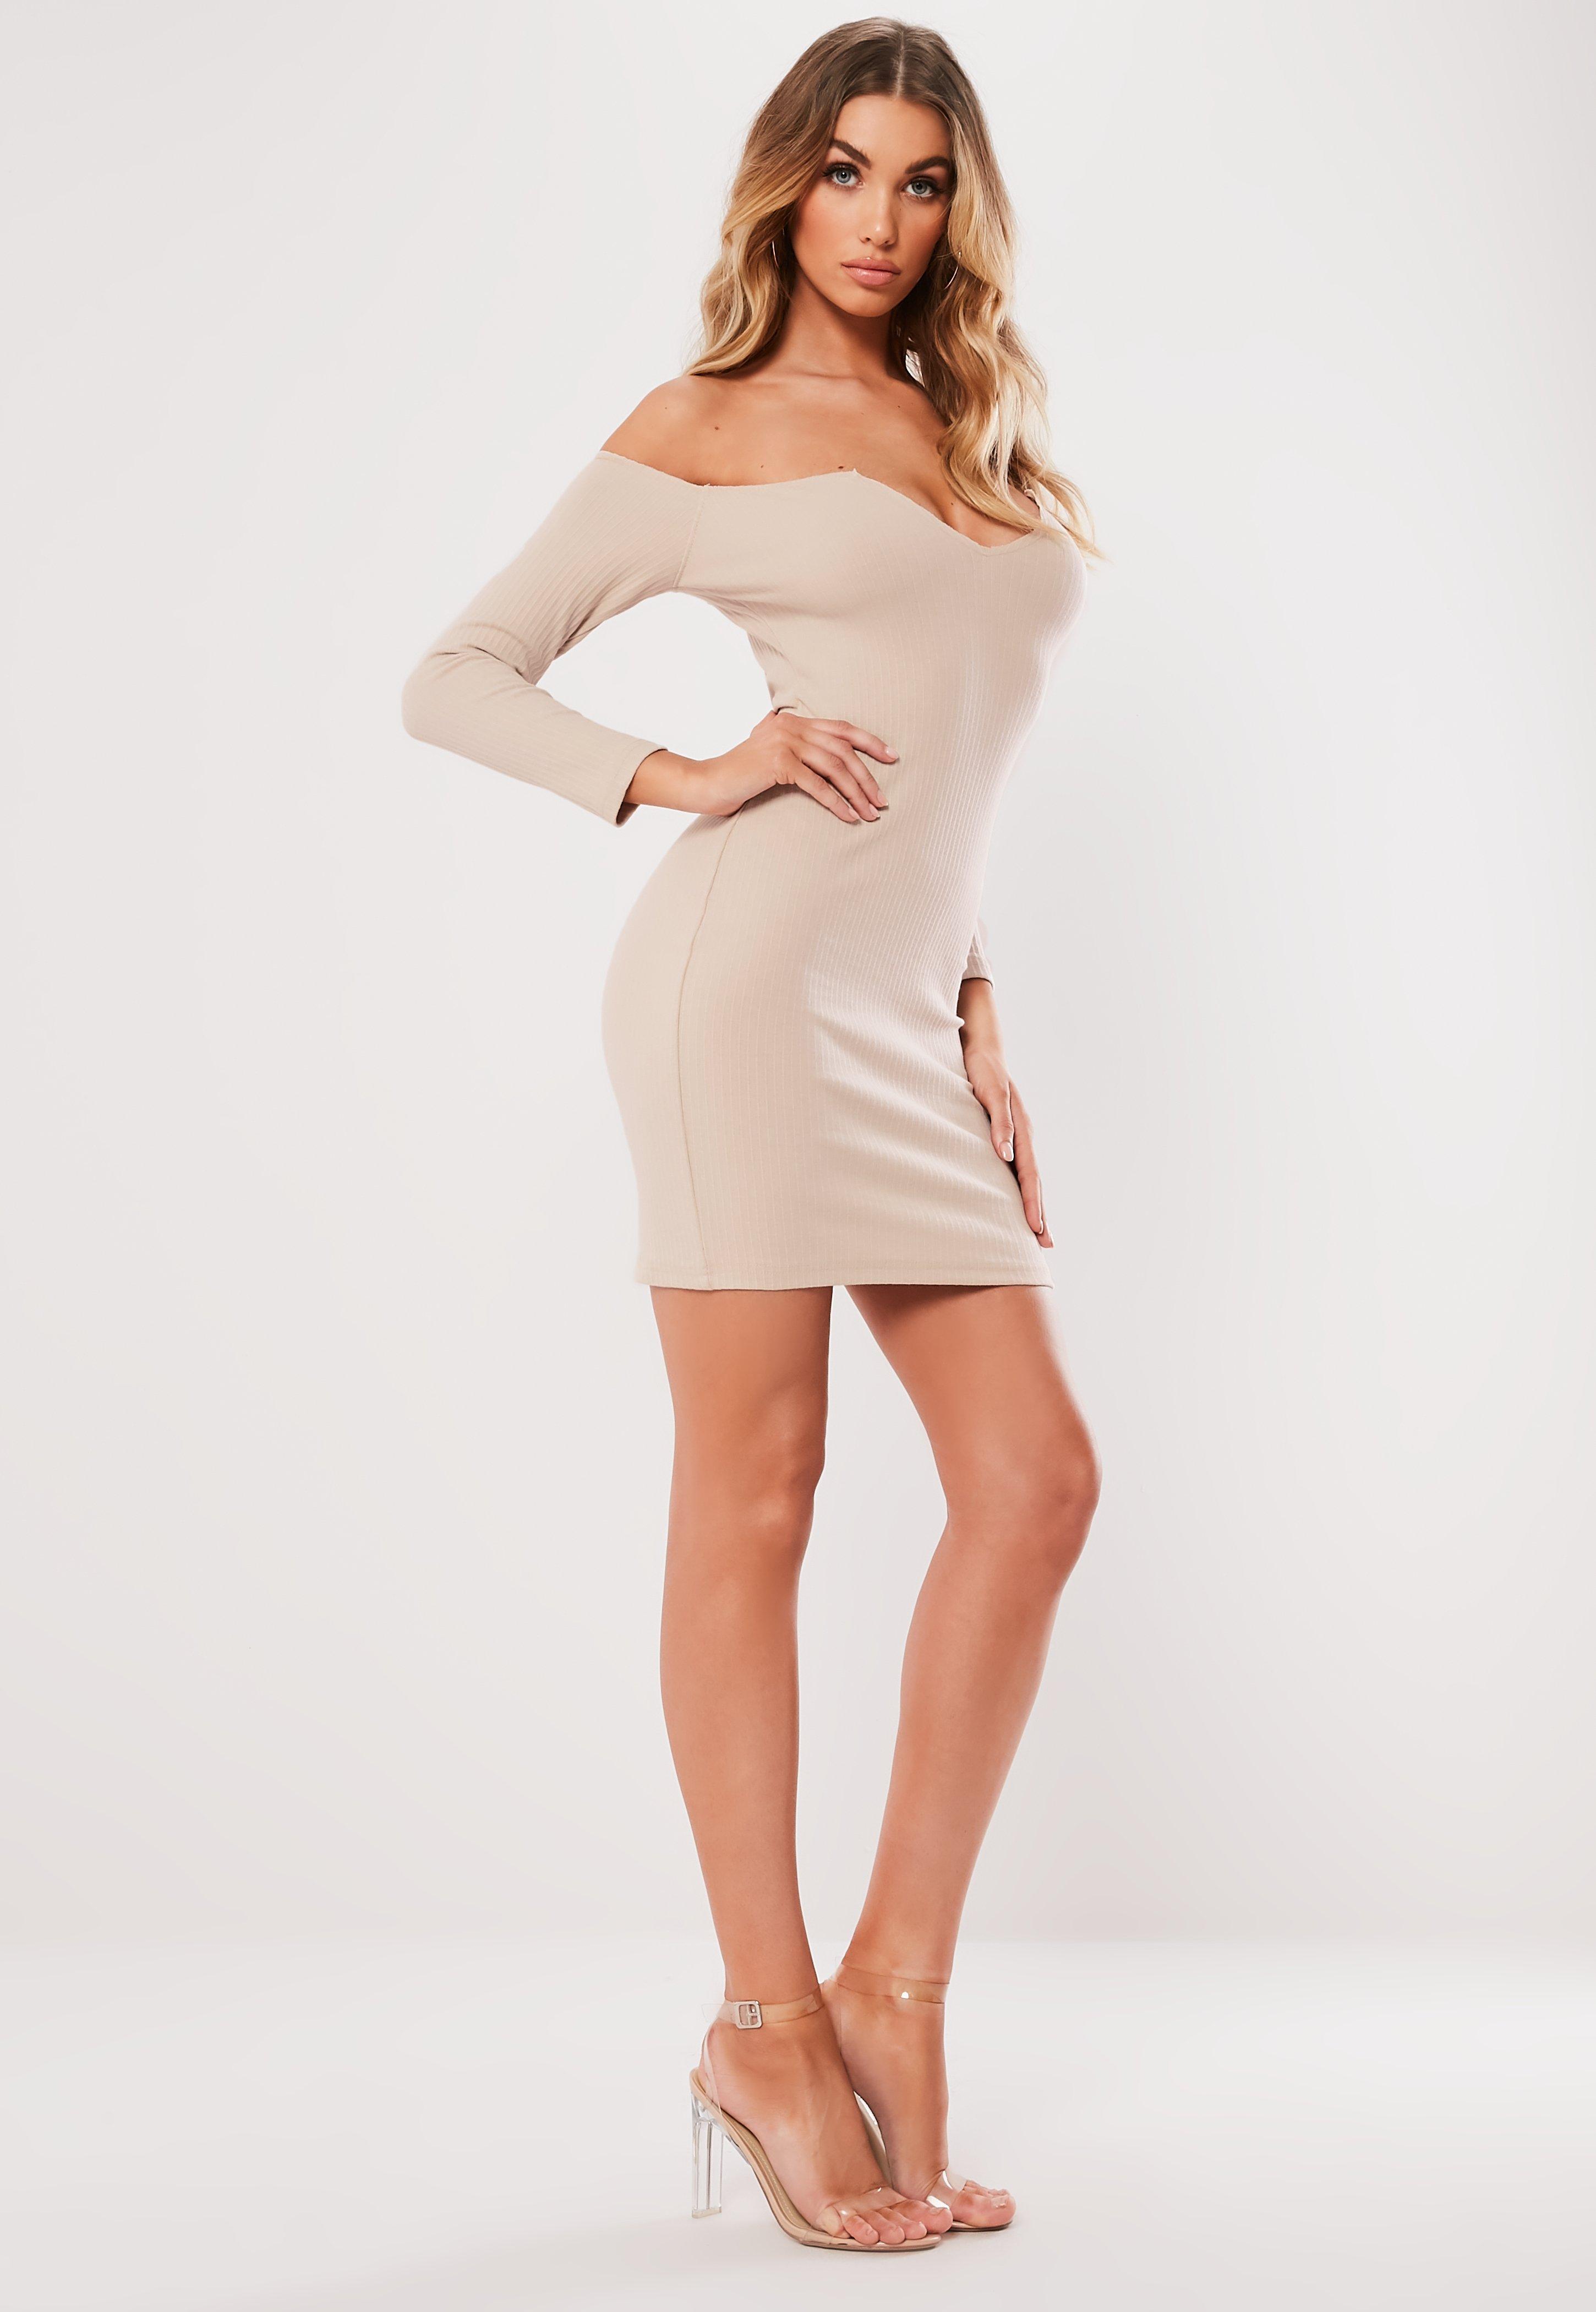 Off the Shoulder Dresses - Bardot Dresses Online  249692aca